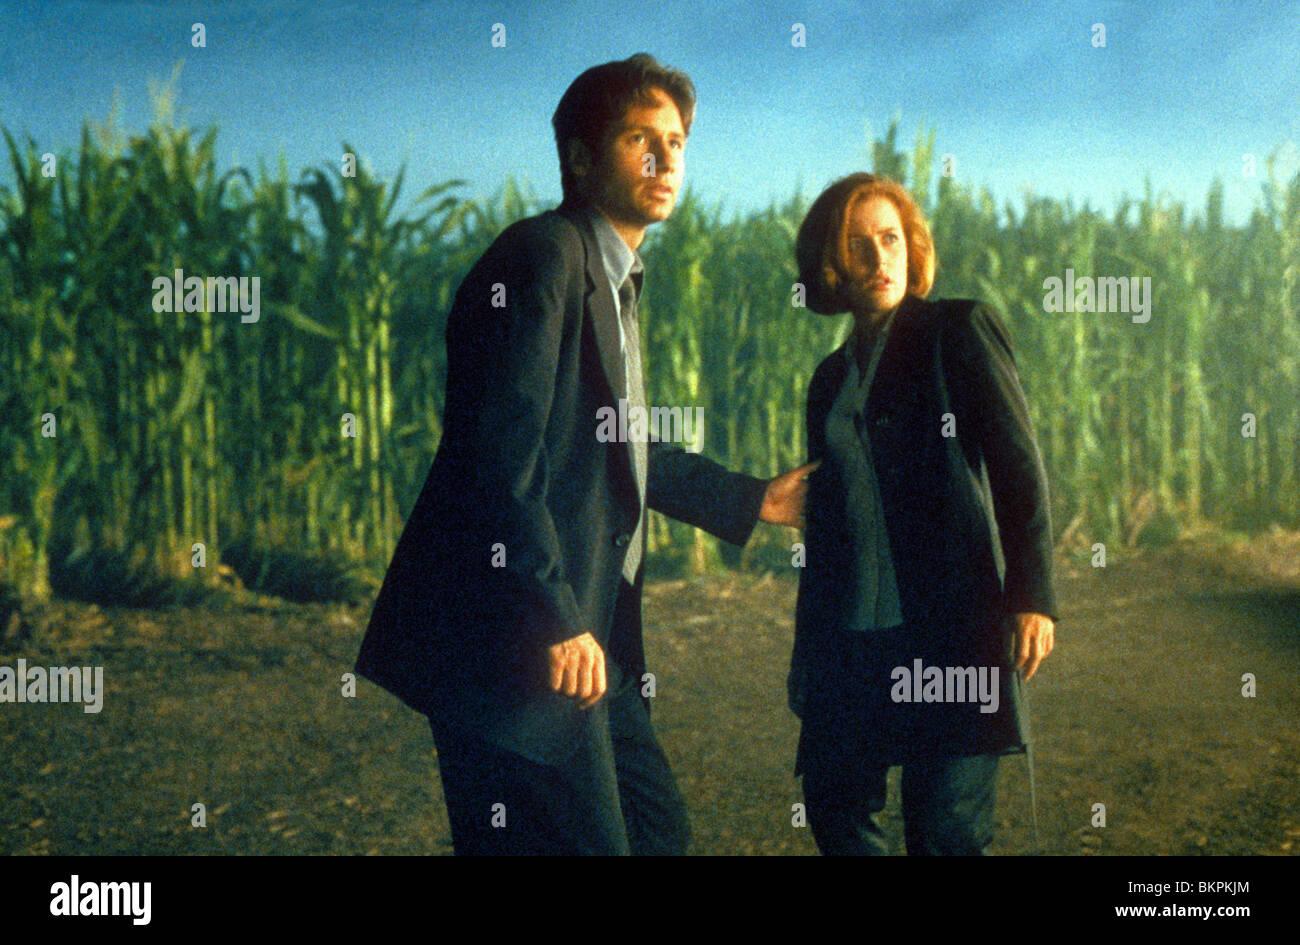 X-FILES: THE MOVIE (1998) DAVID DUCHOVNY, GILLIAN ANDERSON XFM 056 - Stock Image